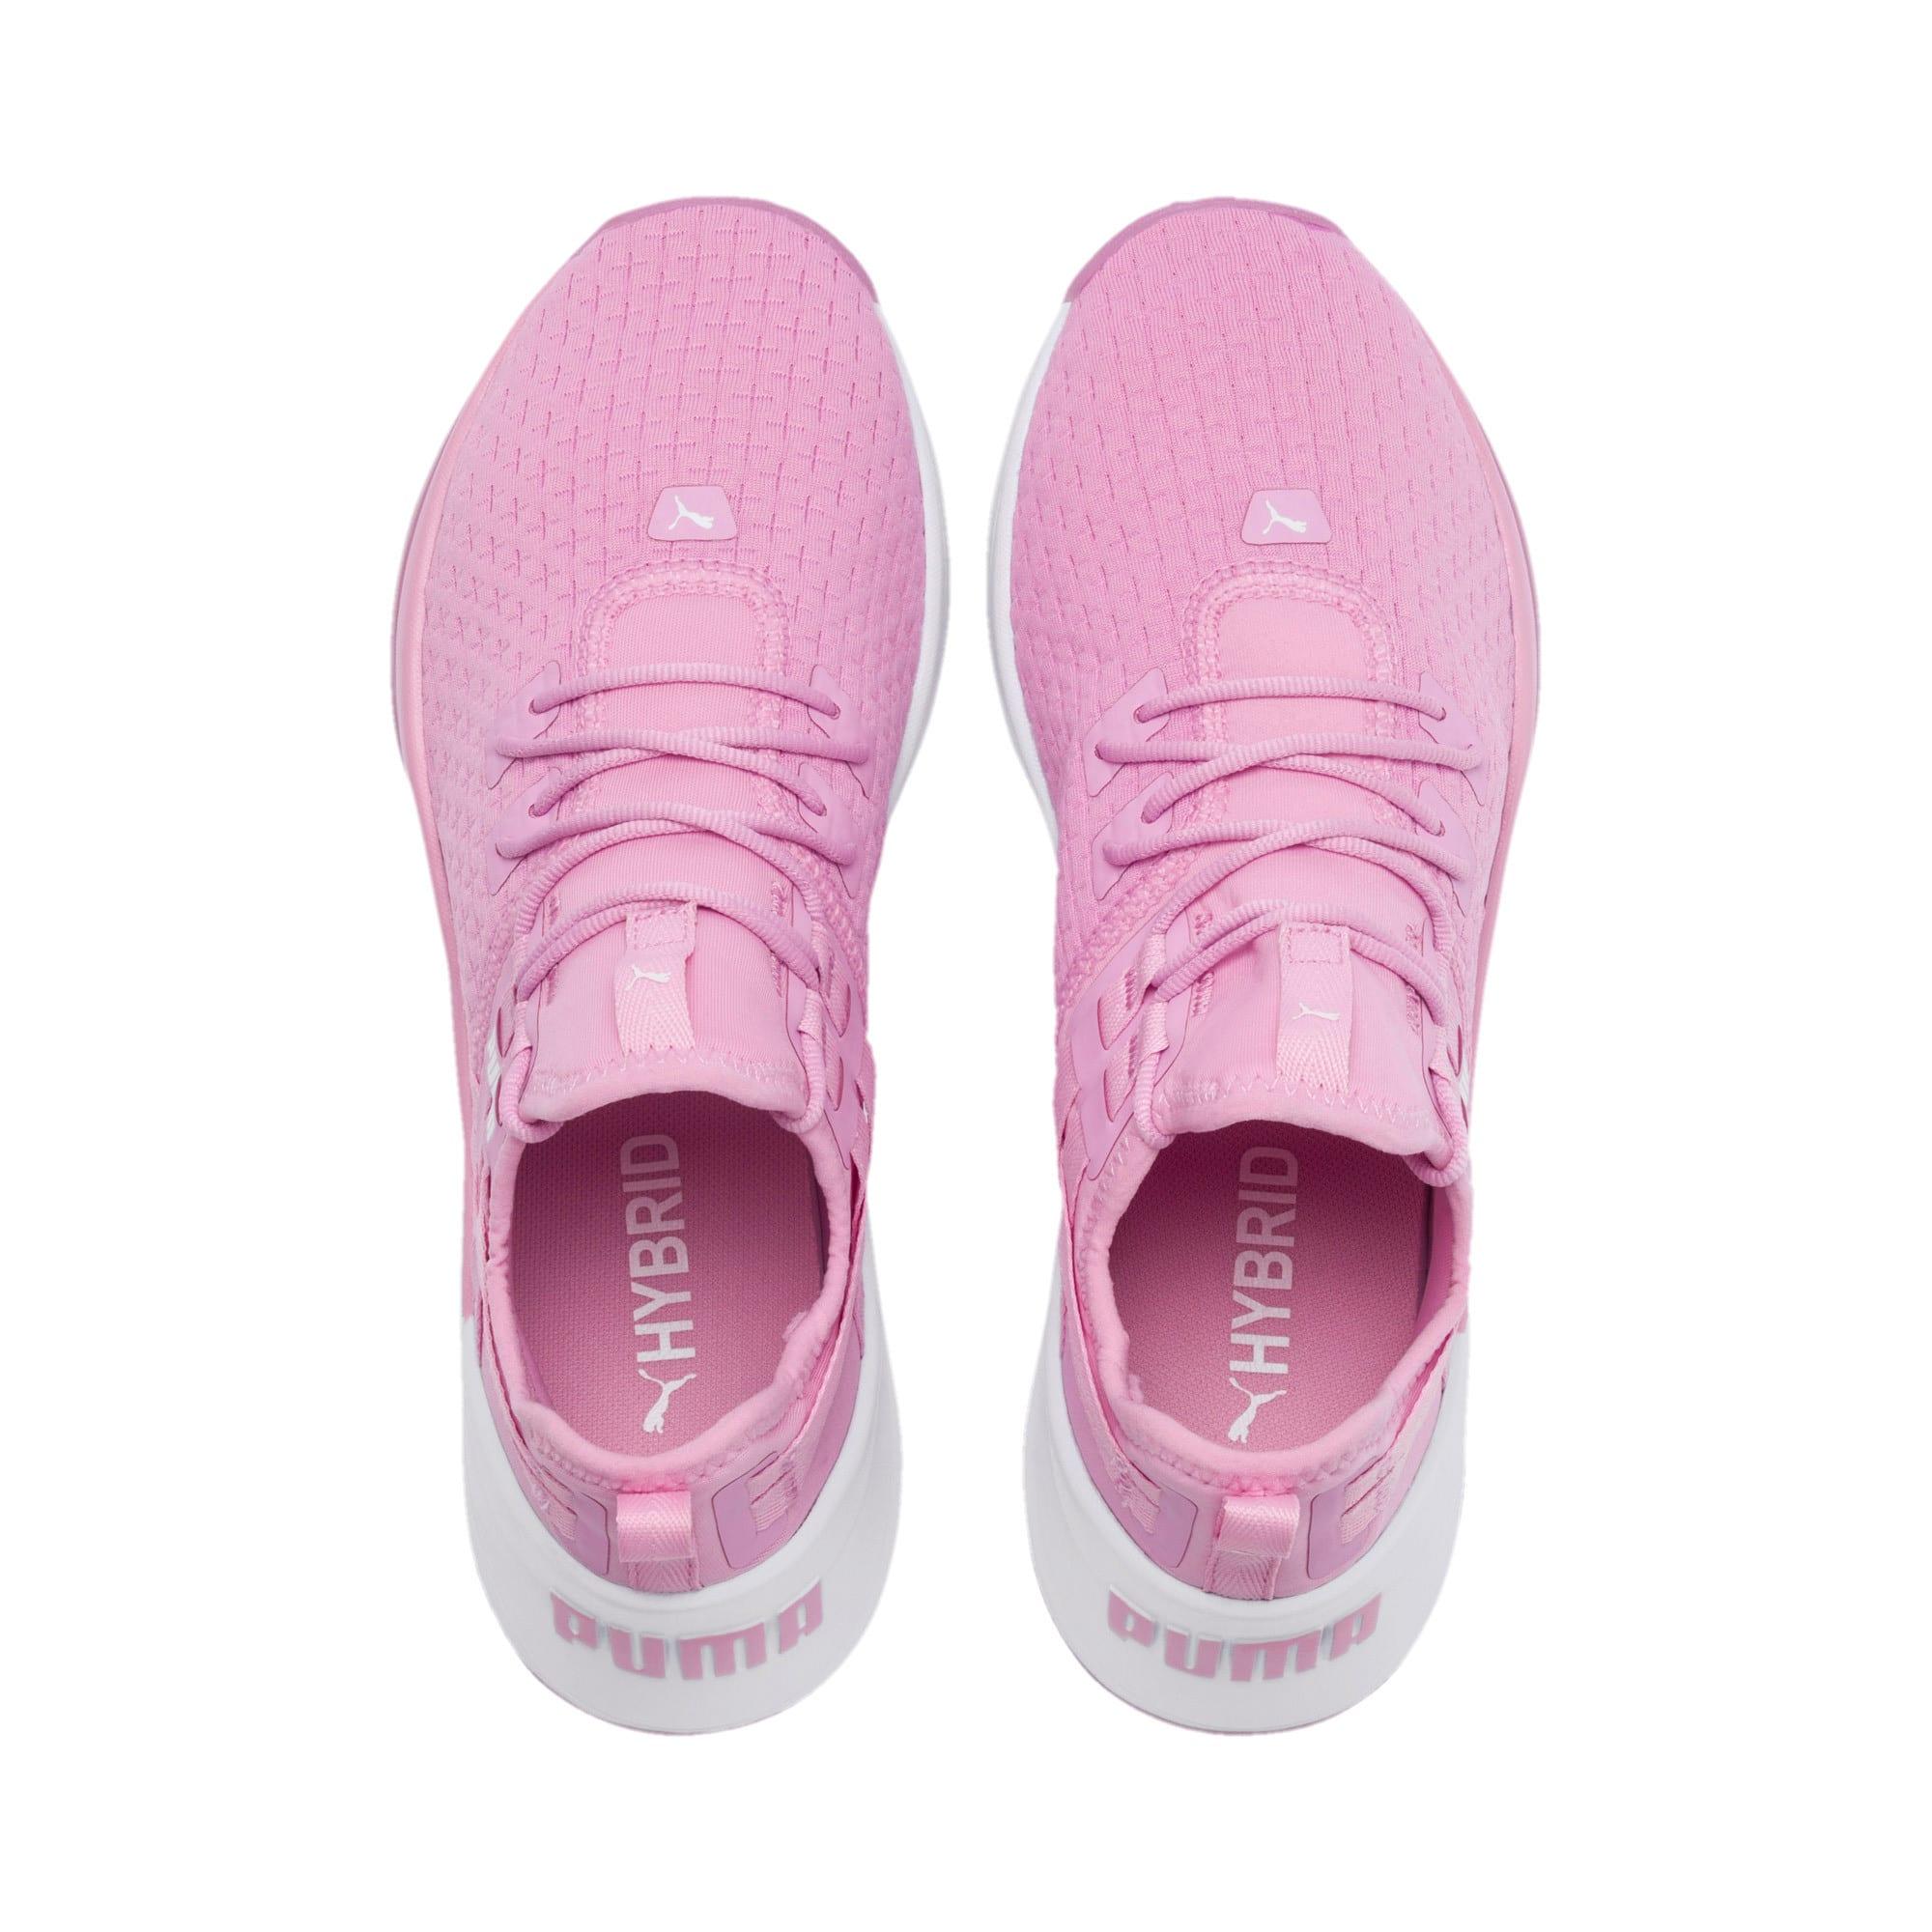 Thumbnail 6 of Jaab XT Women's Training Shoes, Lilac Sachet-Puma White, medium